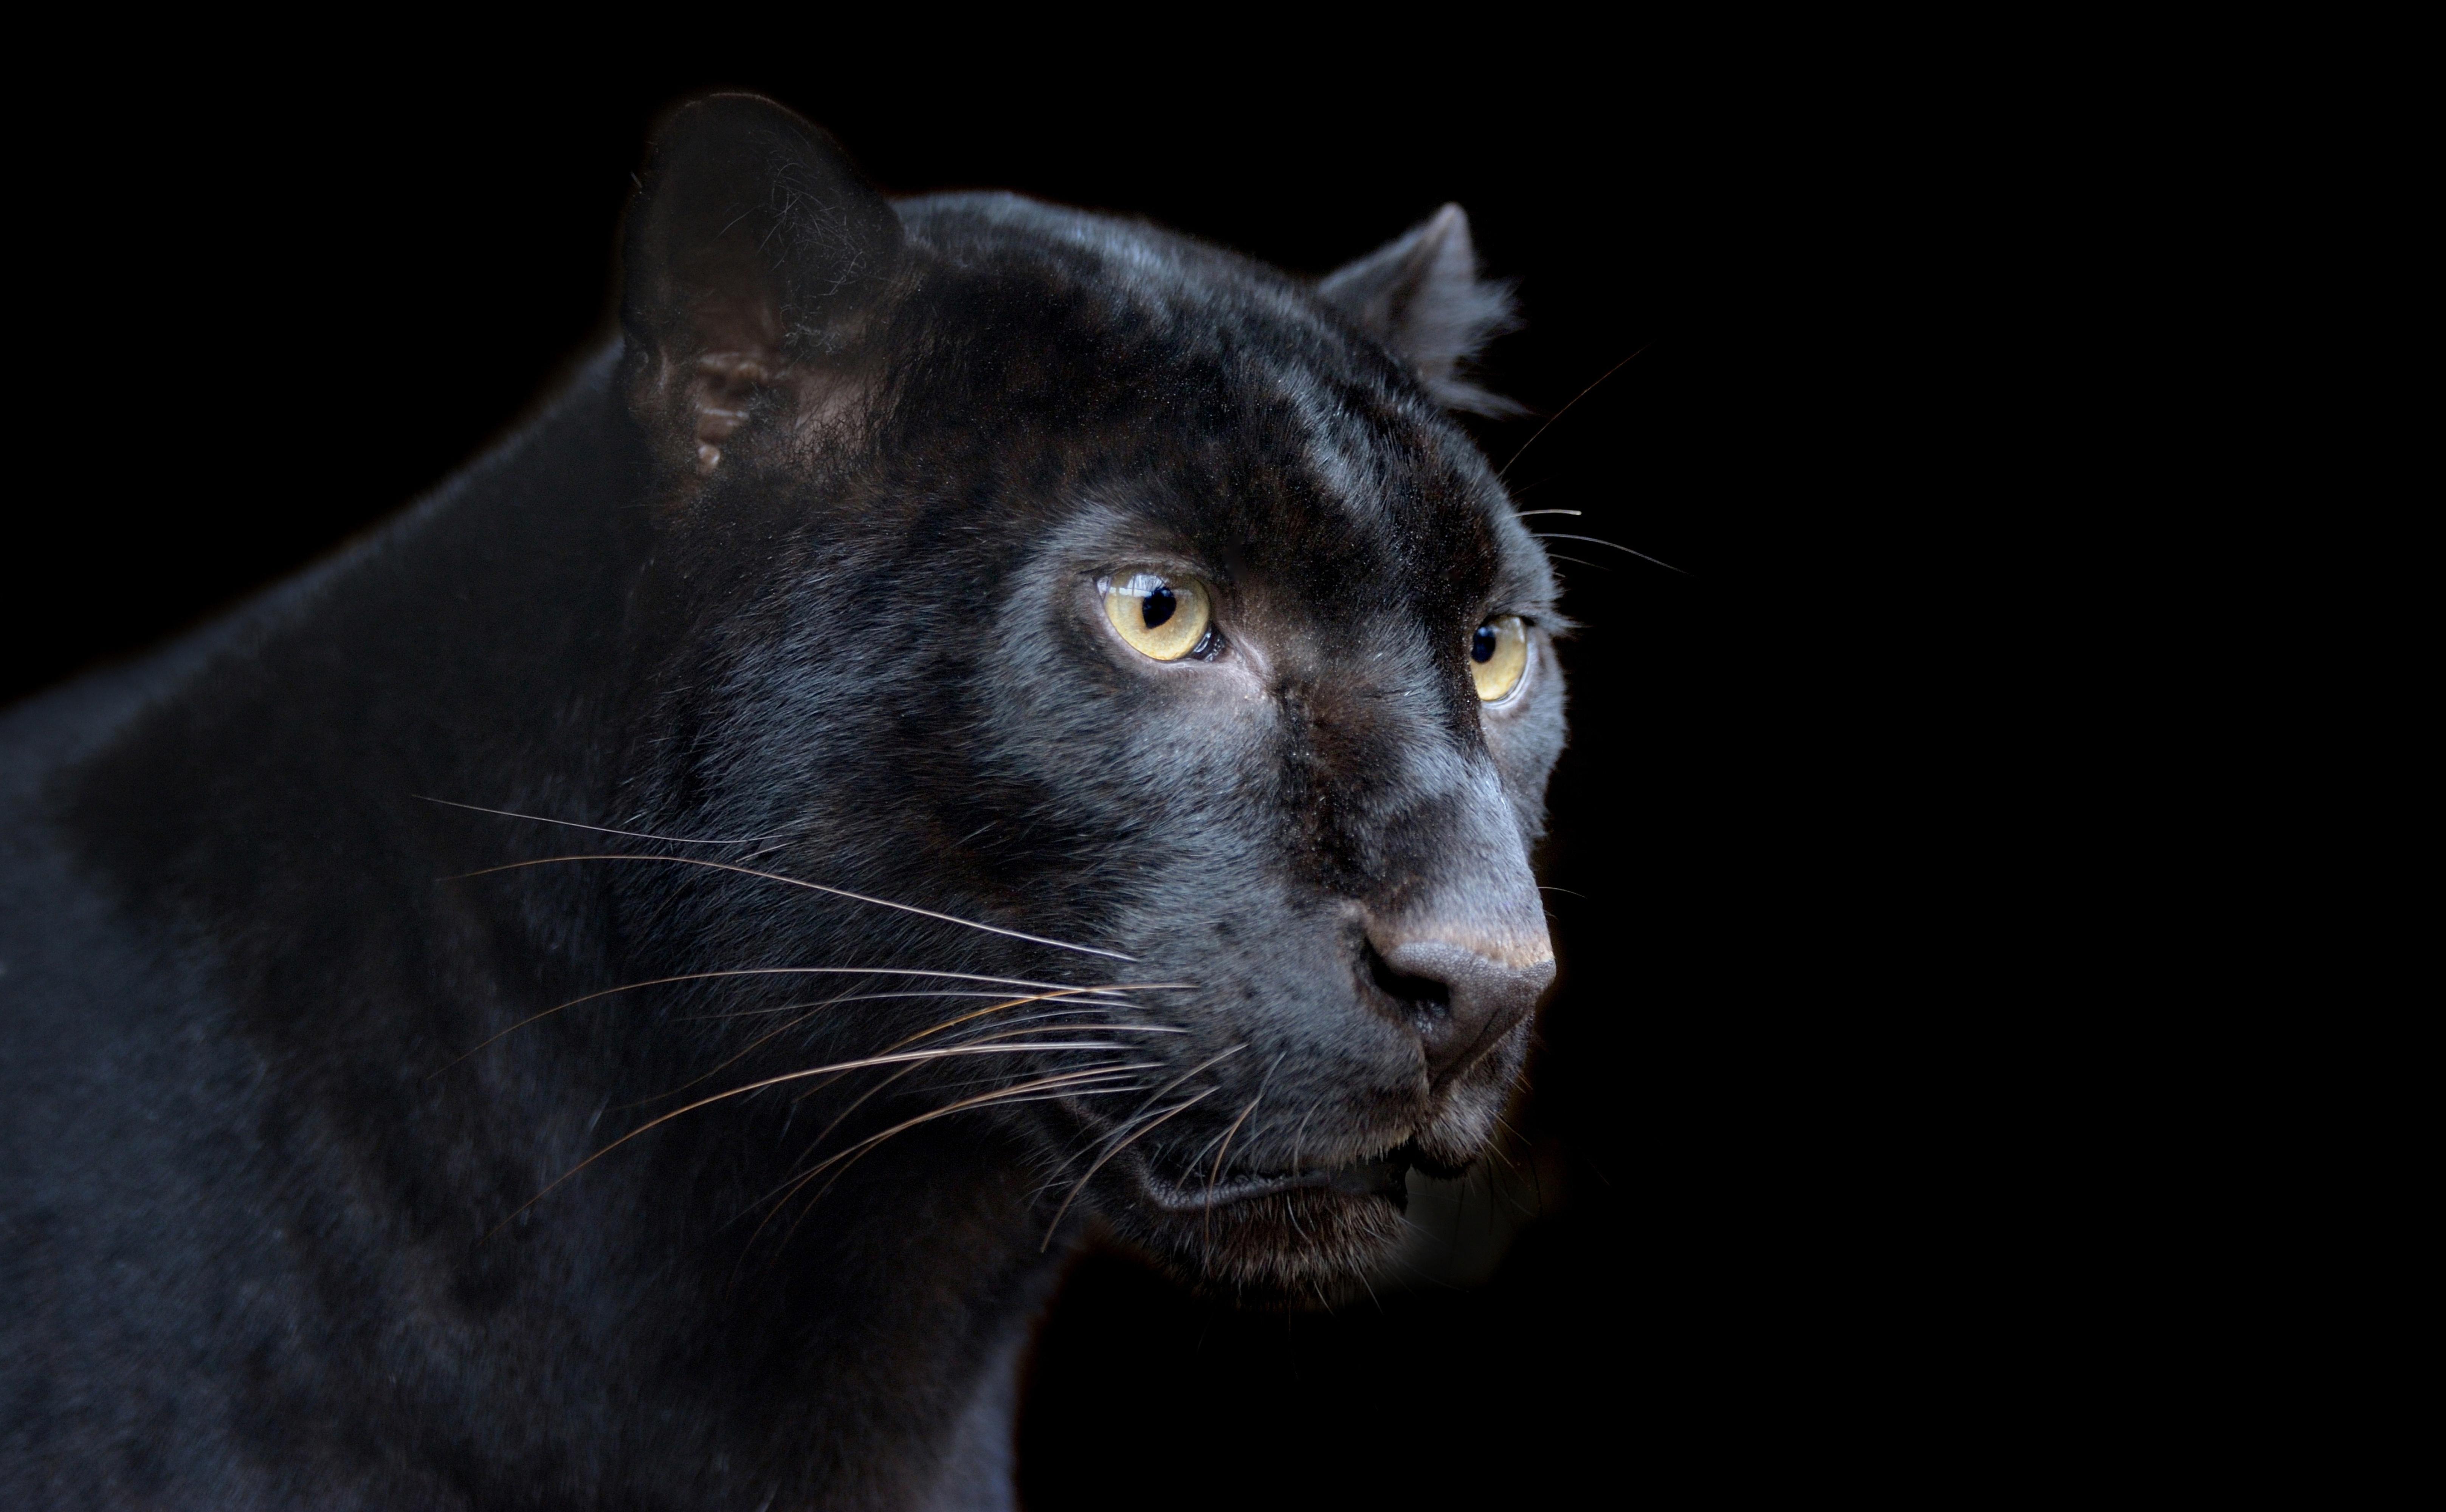 Black Panther Computer Wallpapers Desktop Backgrounds 6470x4000 6470x4000